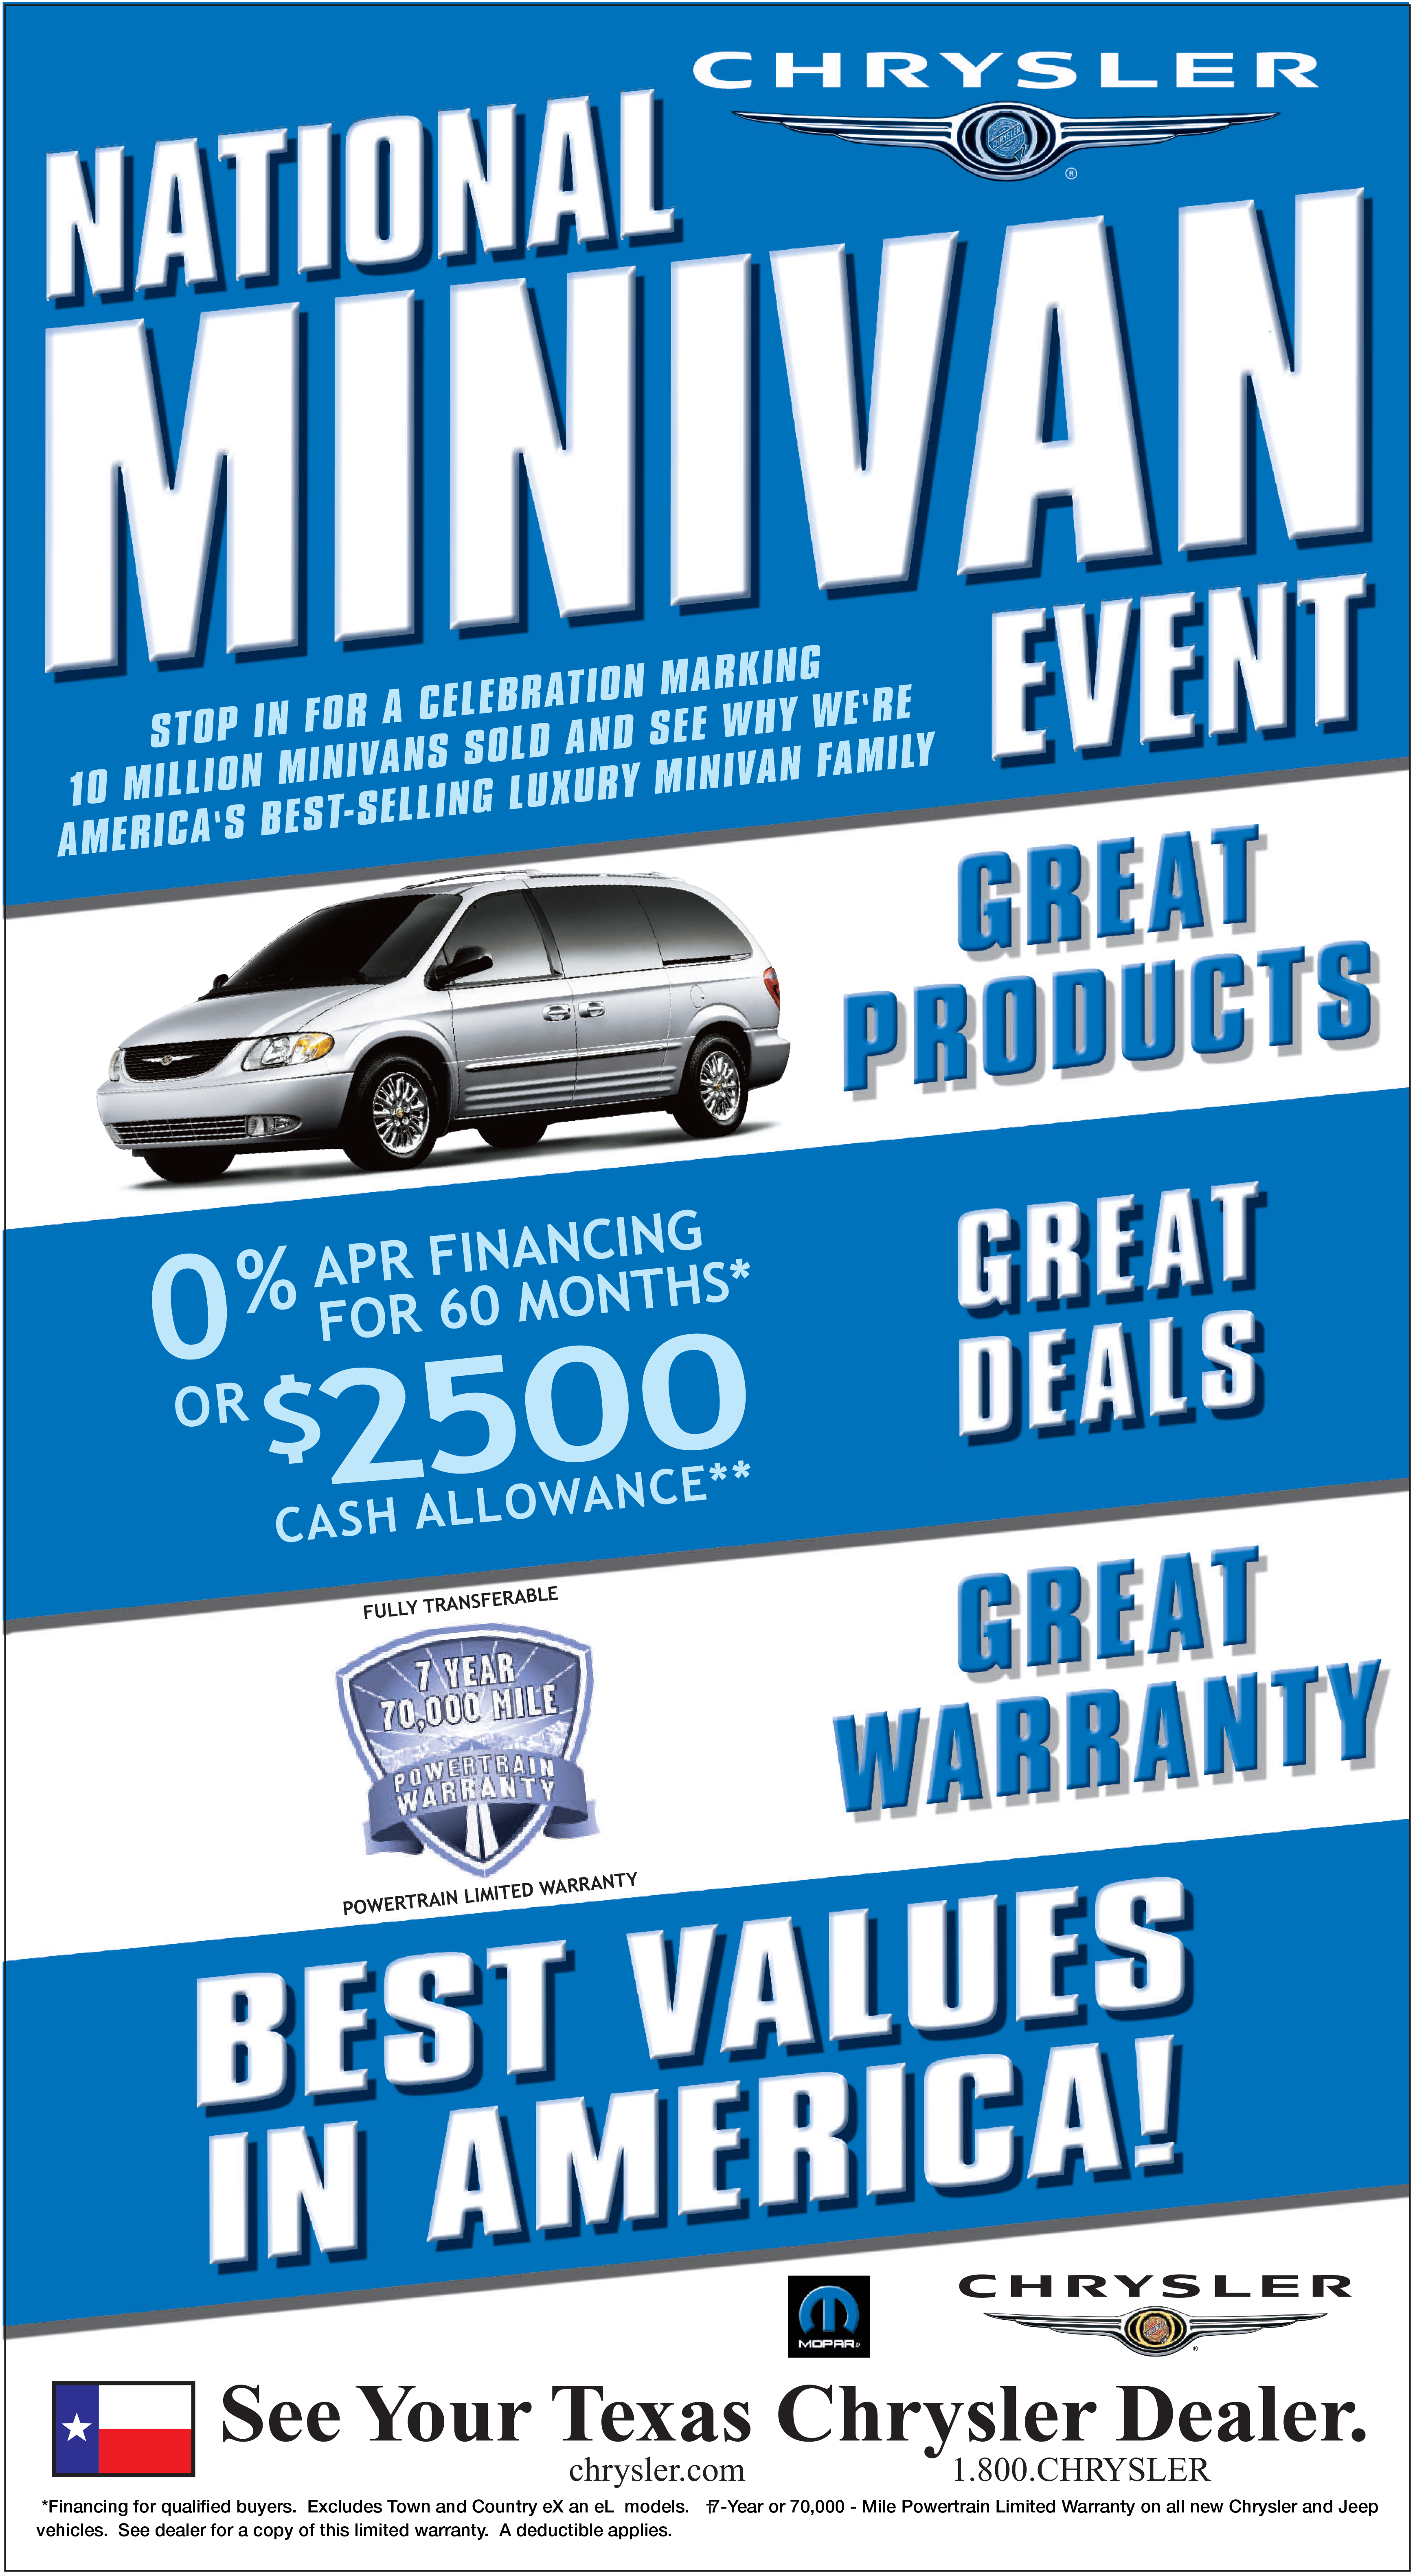 The Concentrium Chrysler Jeep Newspaper Ads